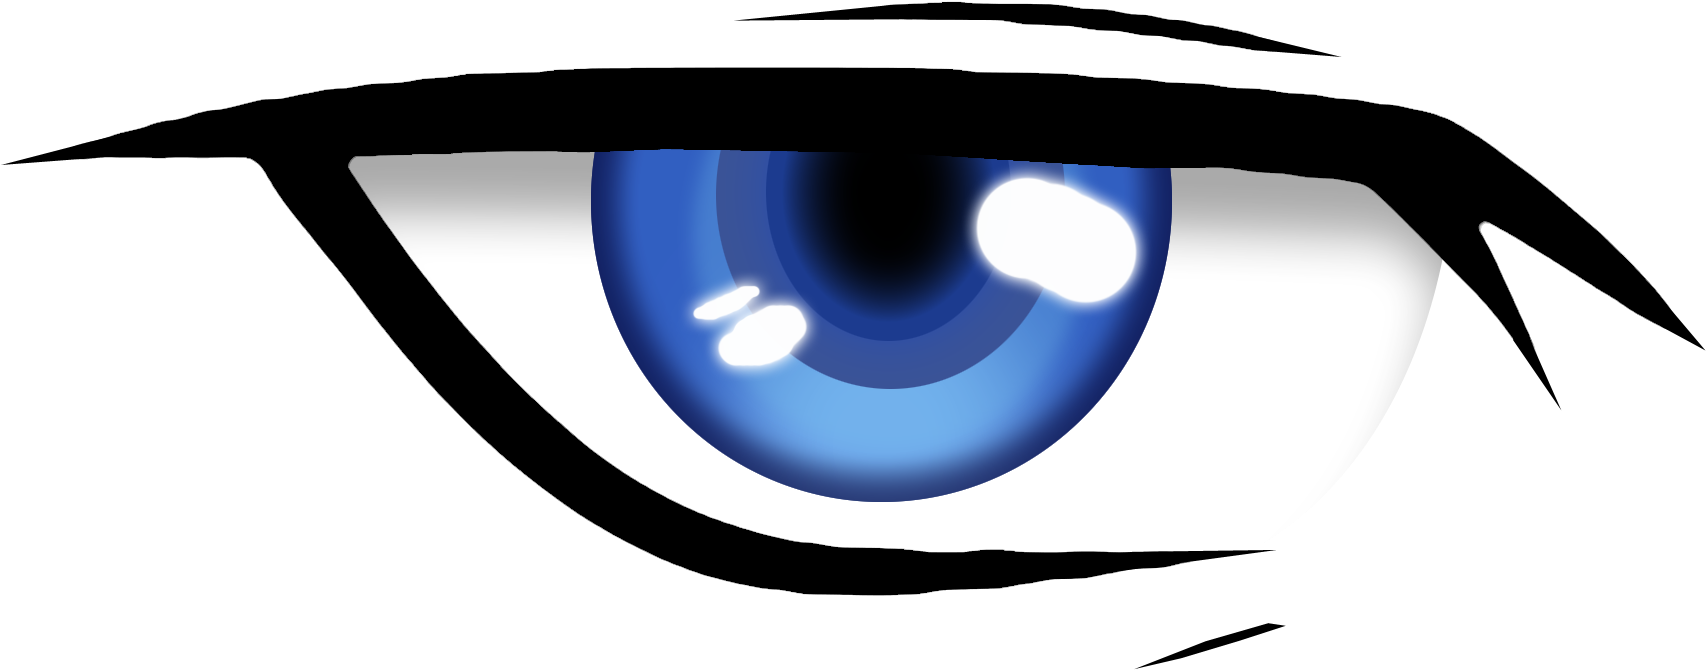 Anime Eye Png Animated Blinking Eye Png Transparent Cartoon